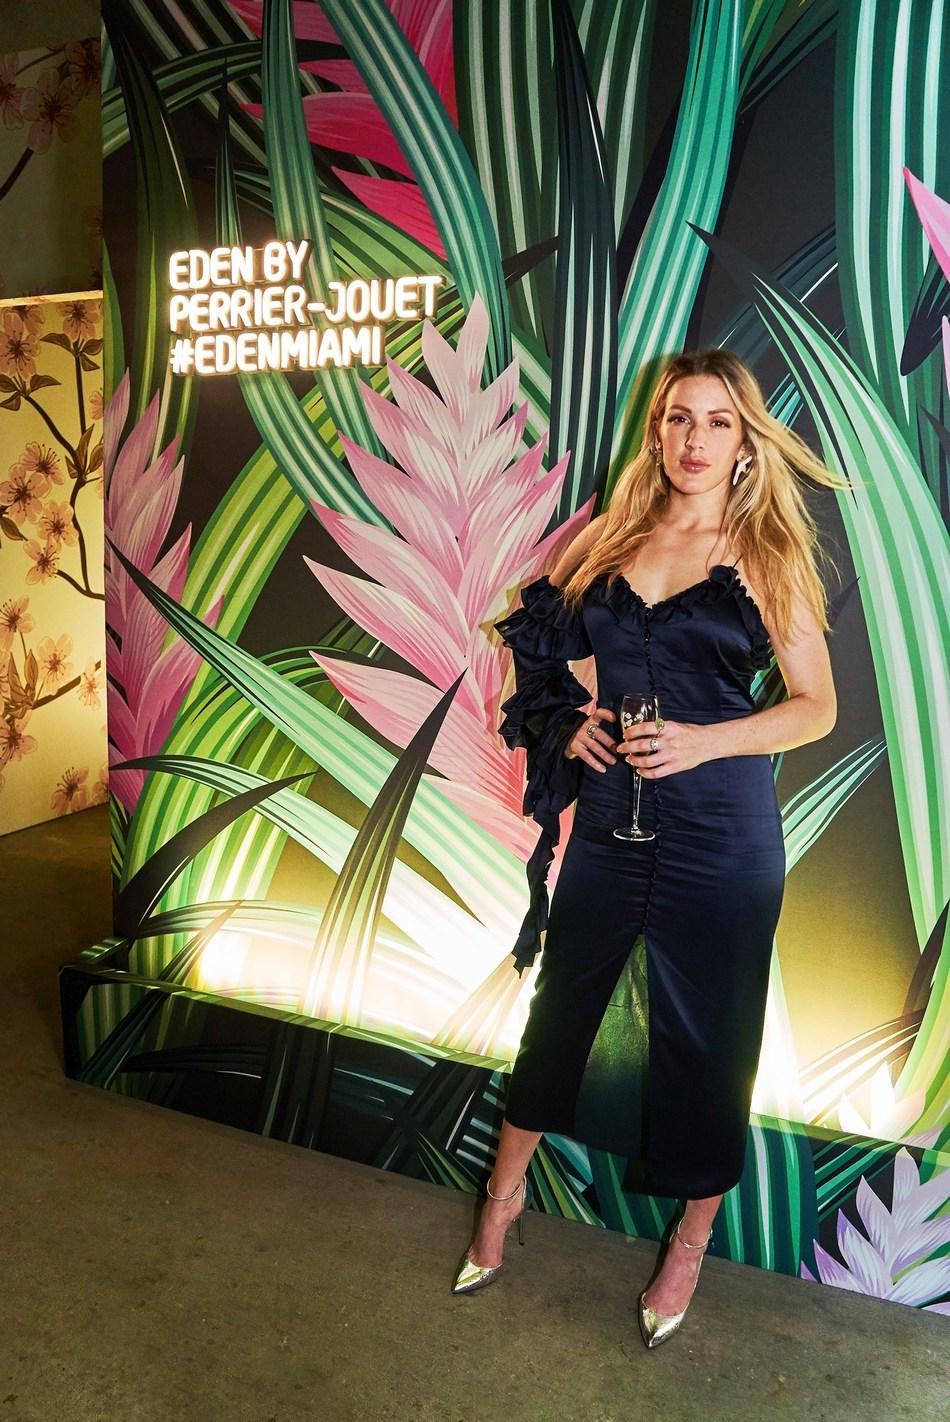 Ellie Goulding at Eden by Perrier-Jouet in Miami (PRNewsfoto/Maison Perrier-Jouet)